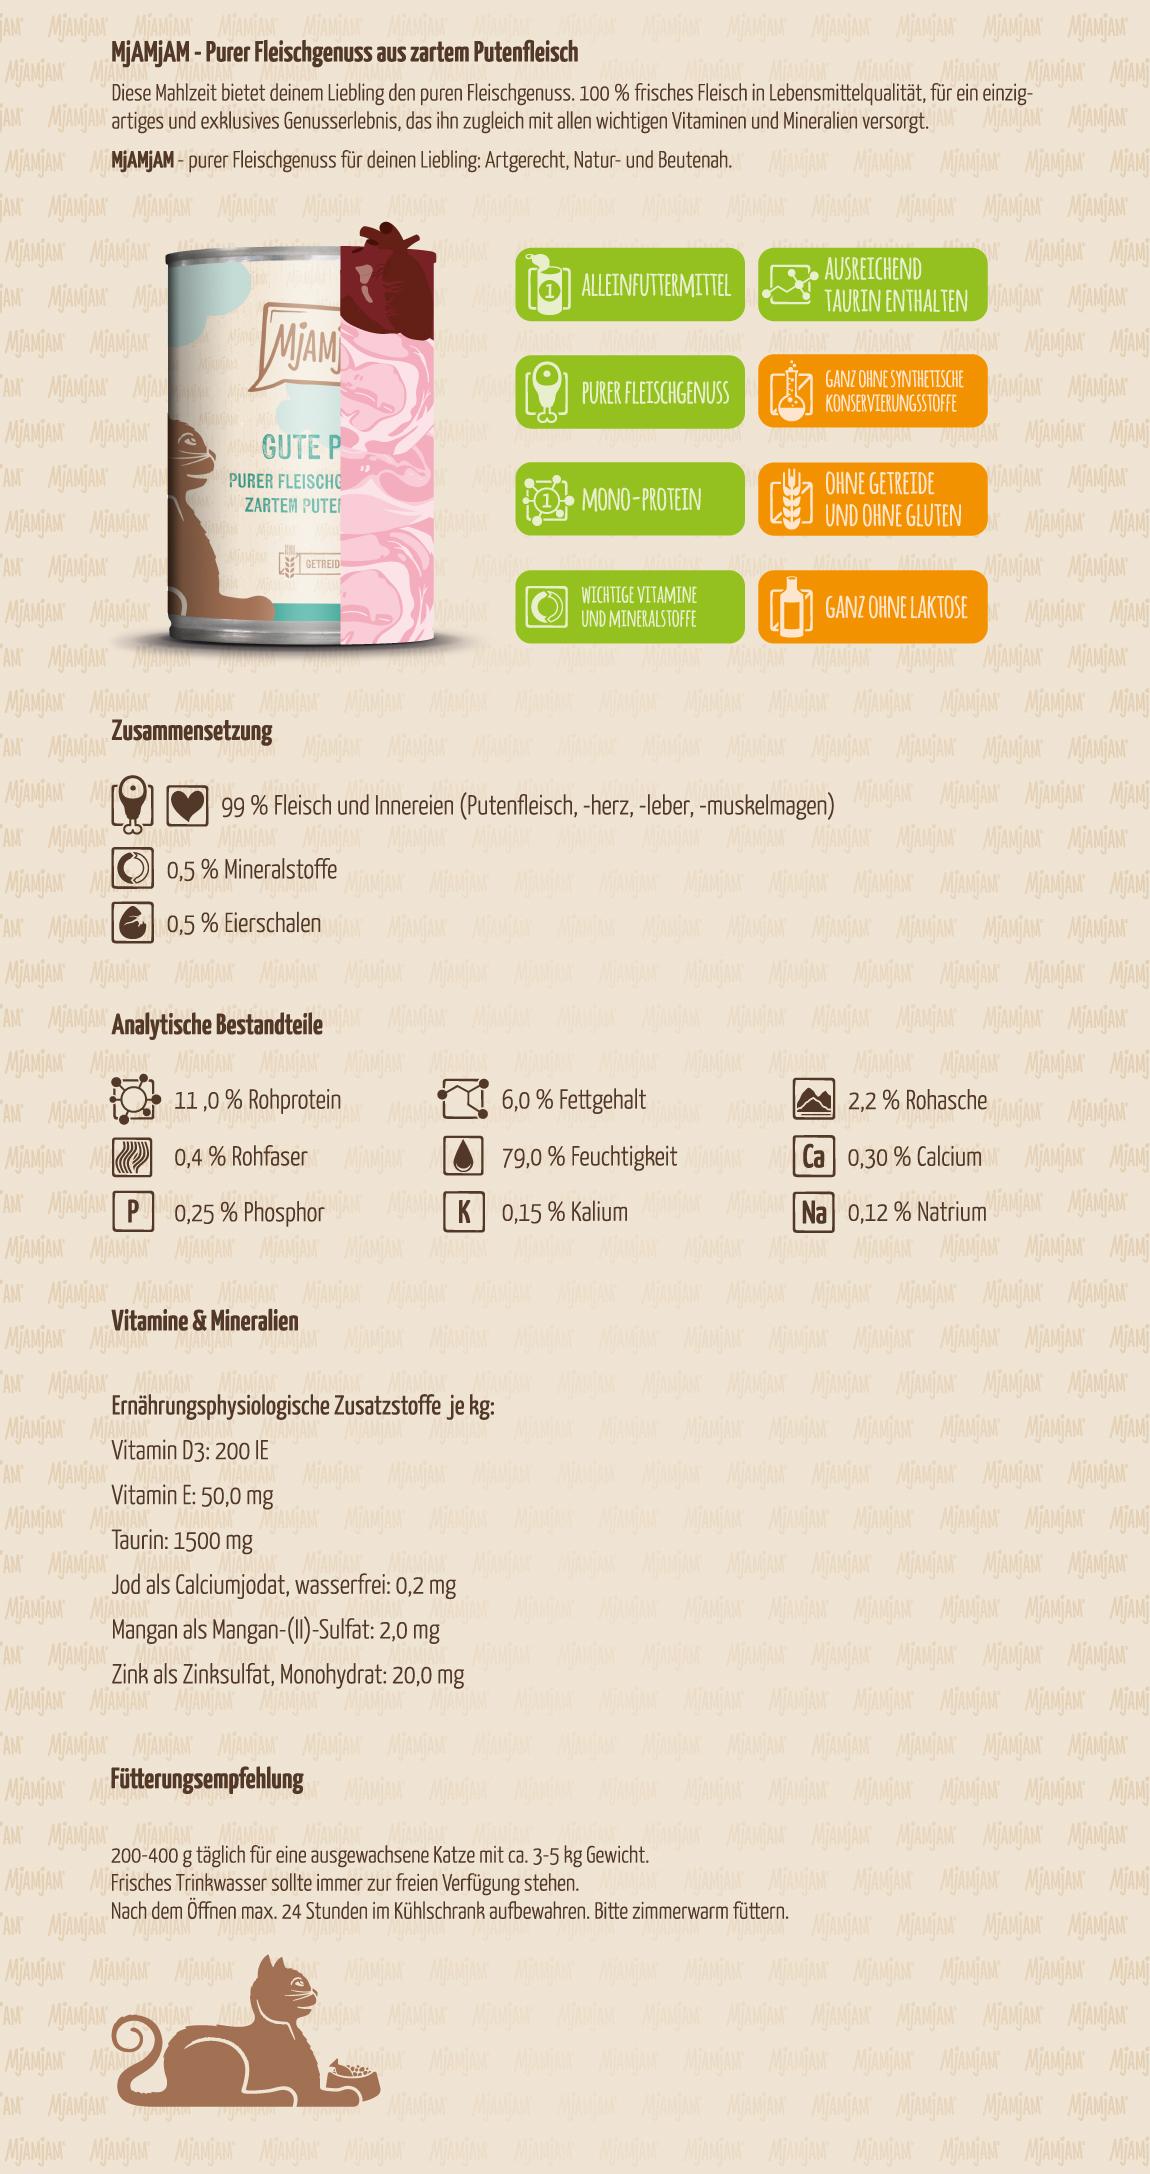 Mjamjam_Produktbeschreibung_Katze_PUR_Gute-Pute